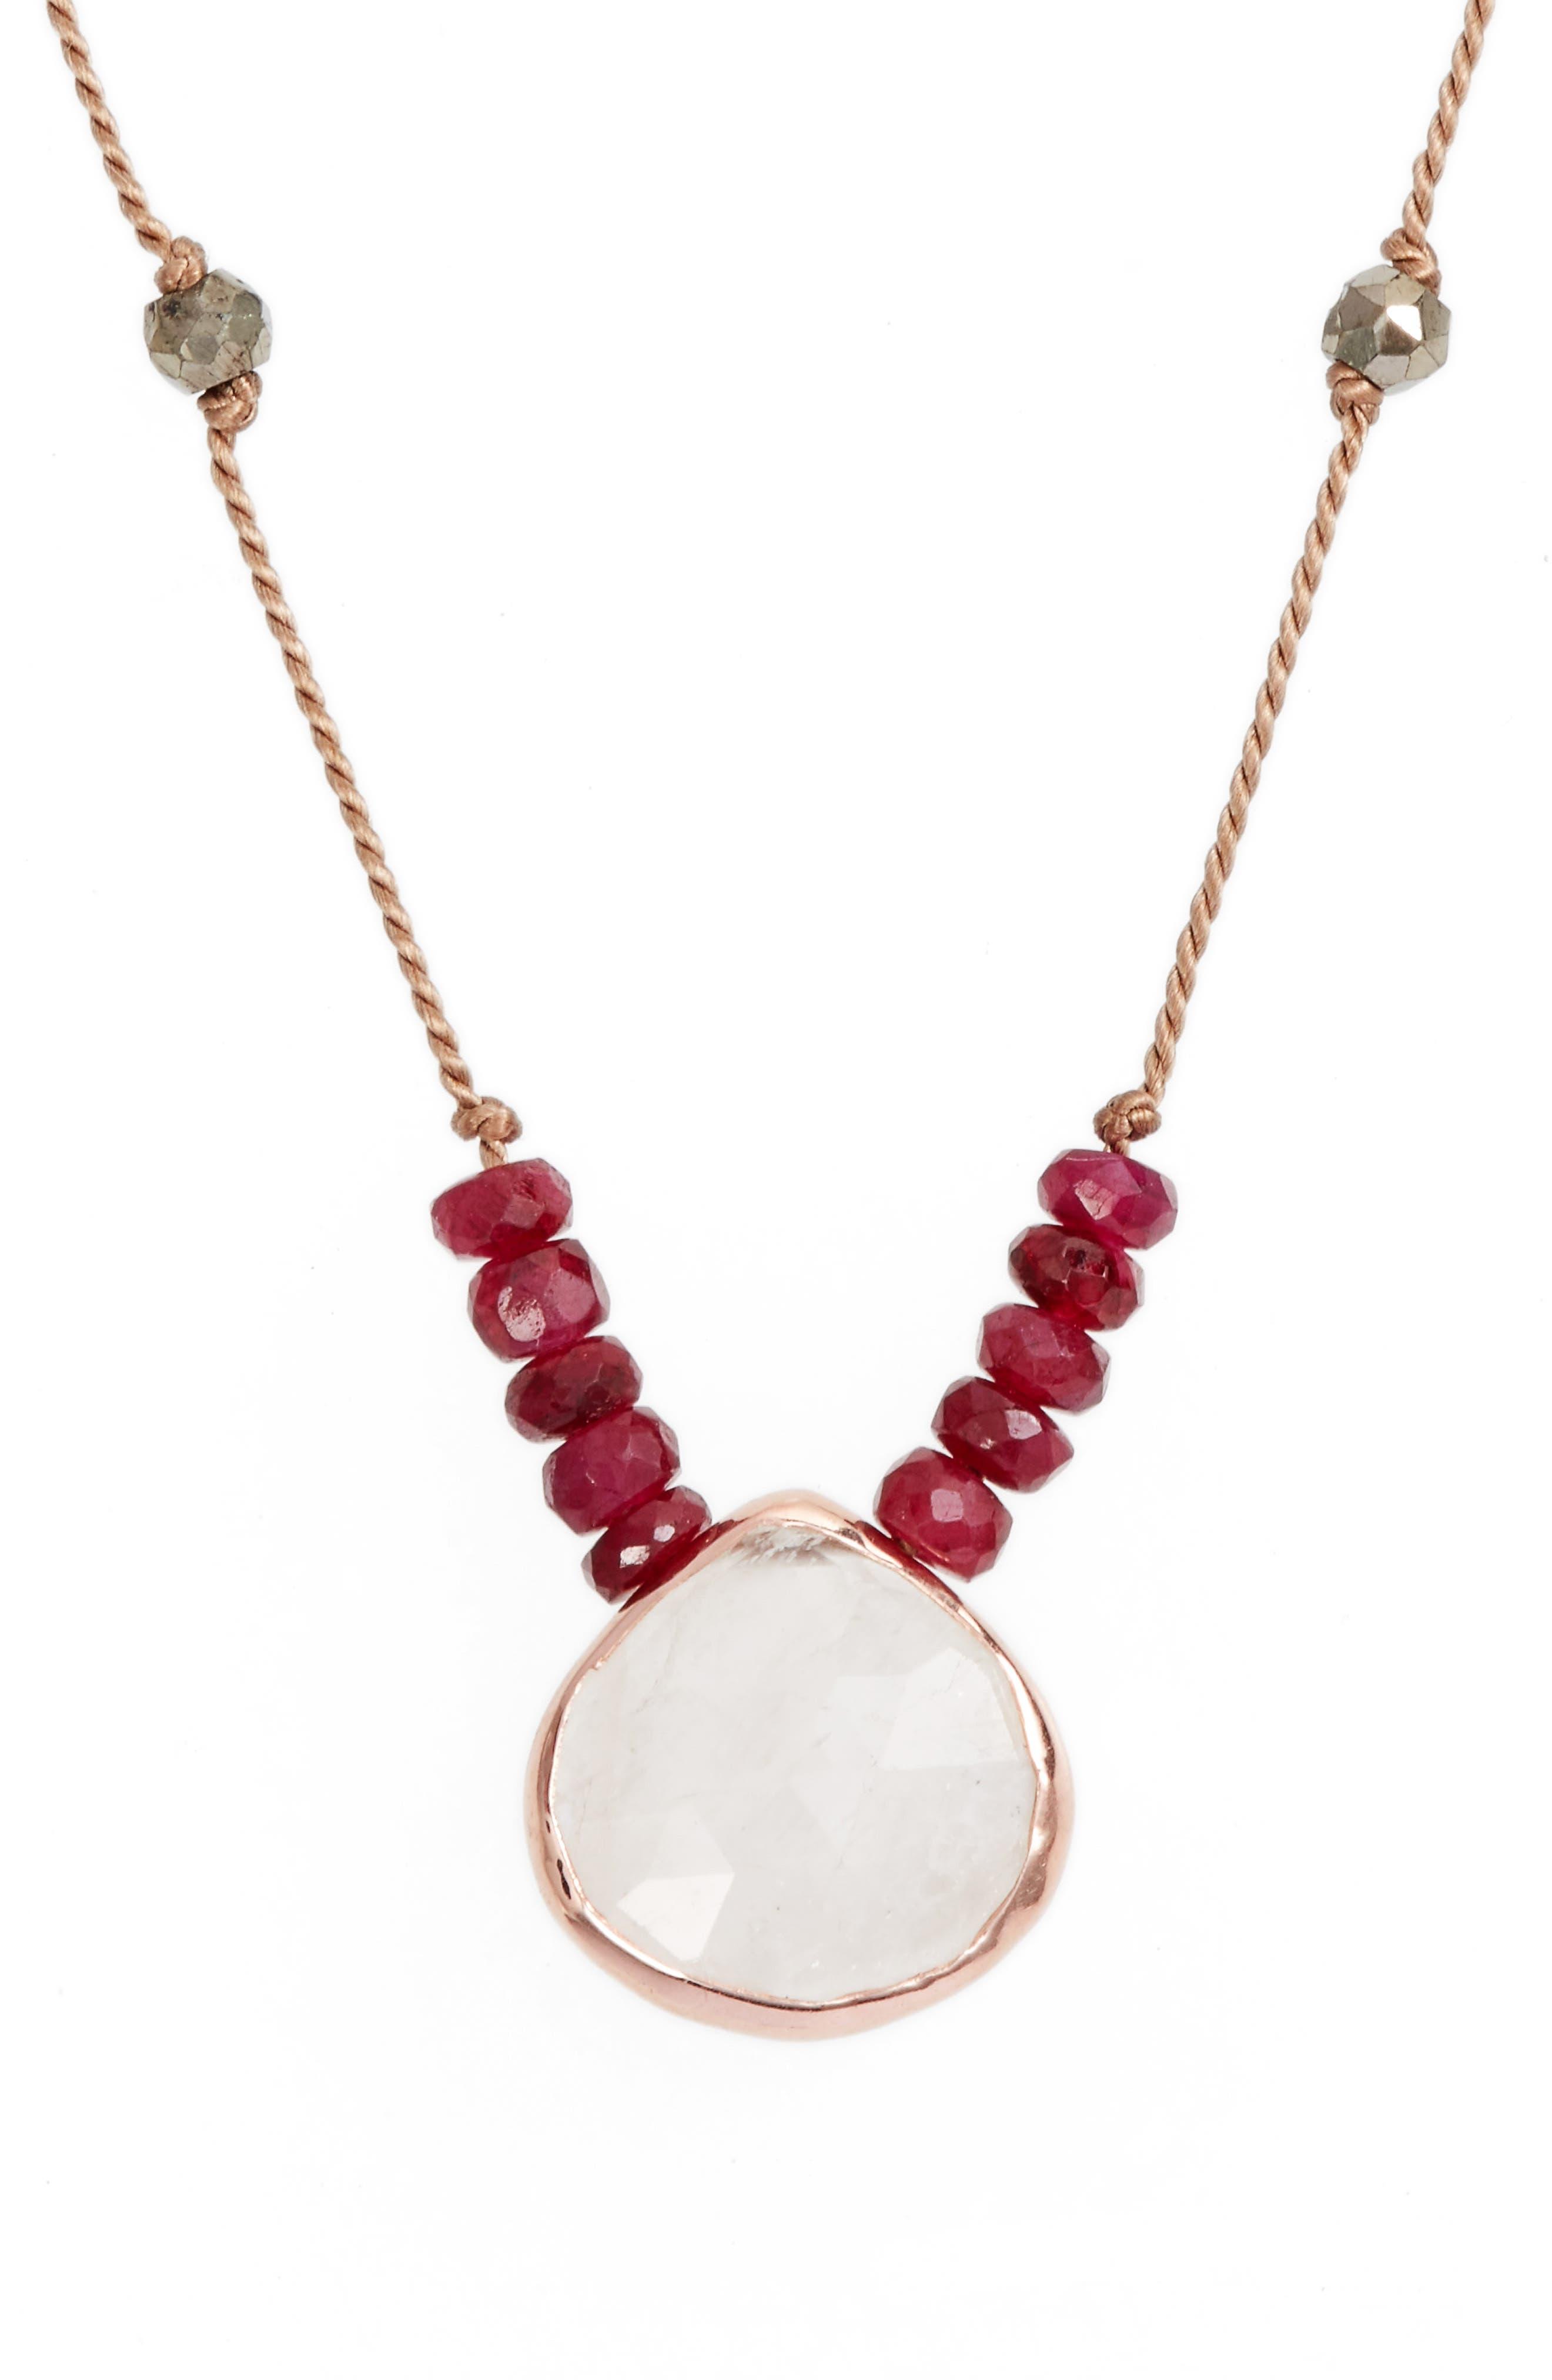 Sylvie Semiprecious Stone Necklace,                             Main thumbnail 1, color,                             MOONSTONE